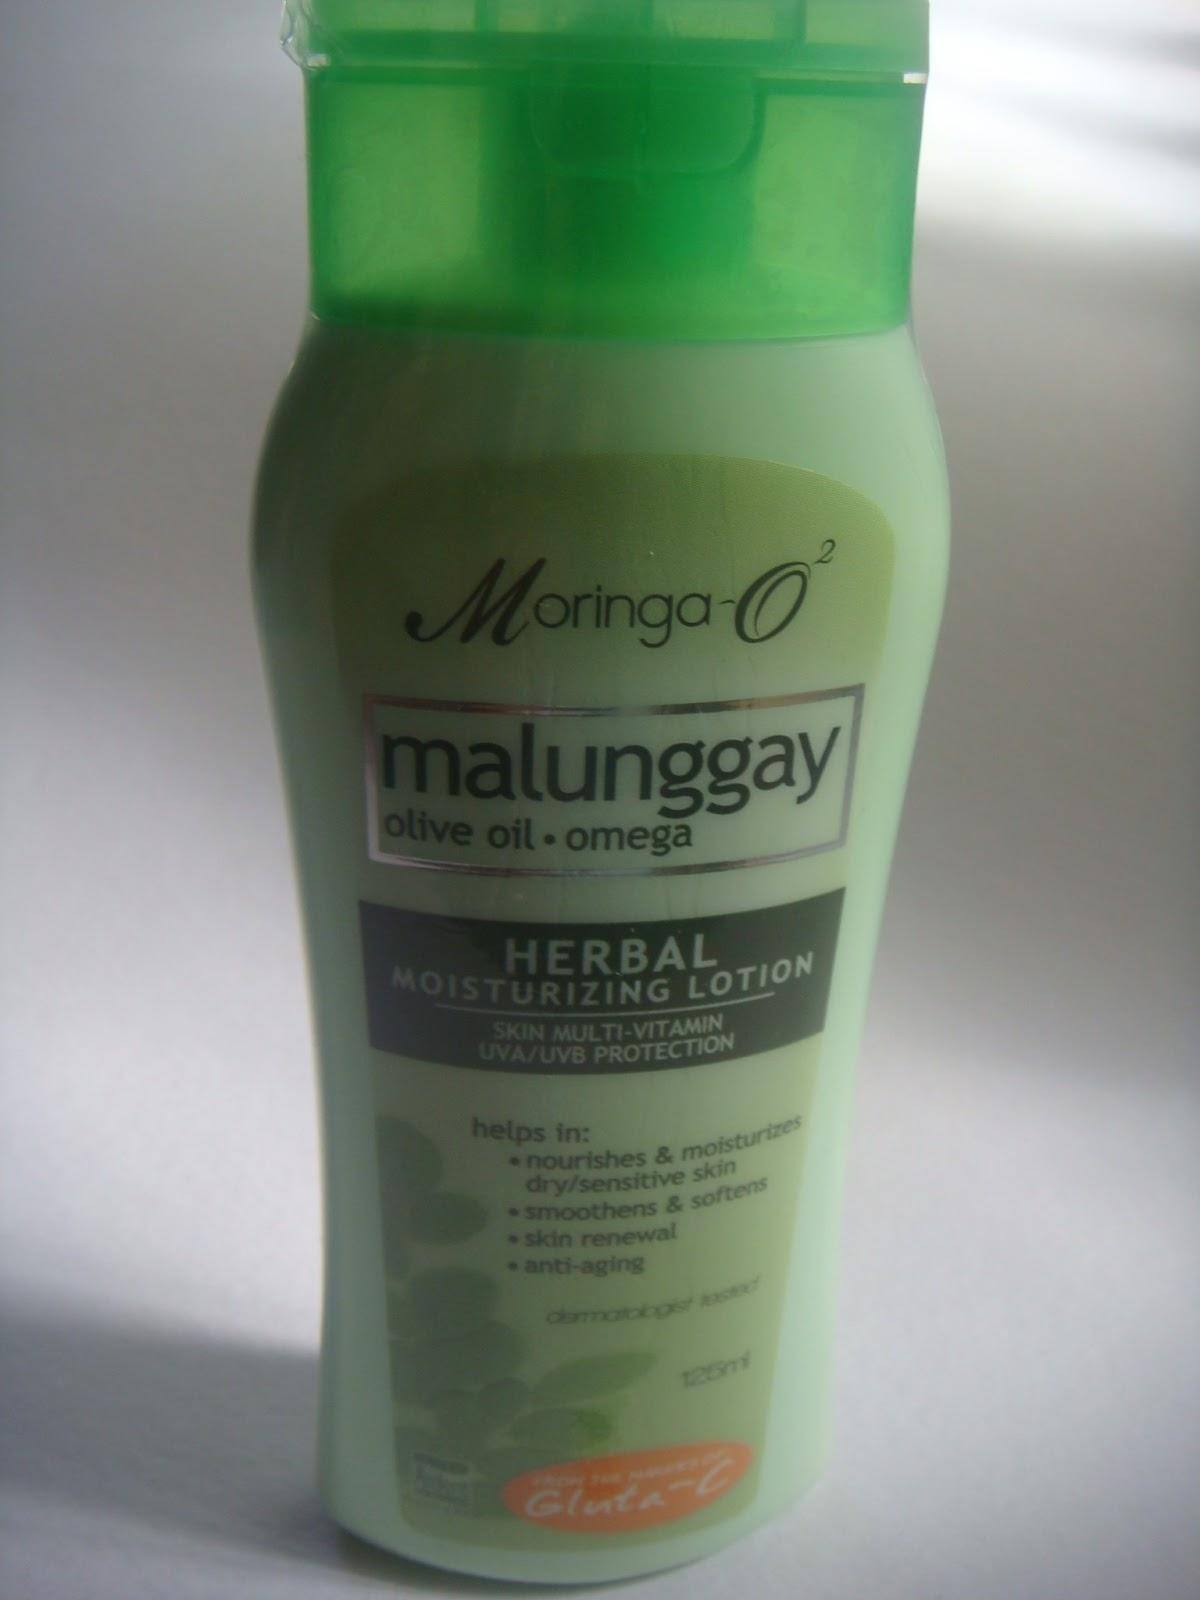 Malunggay lotion